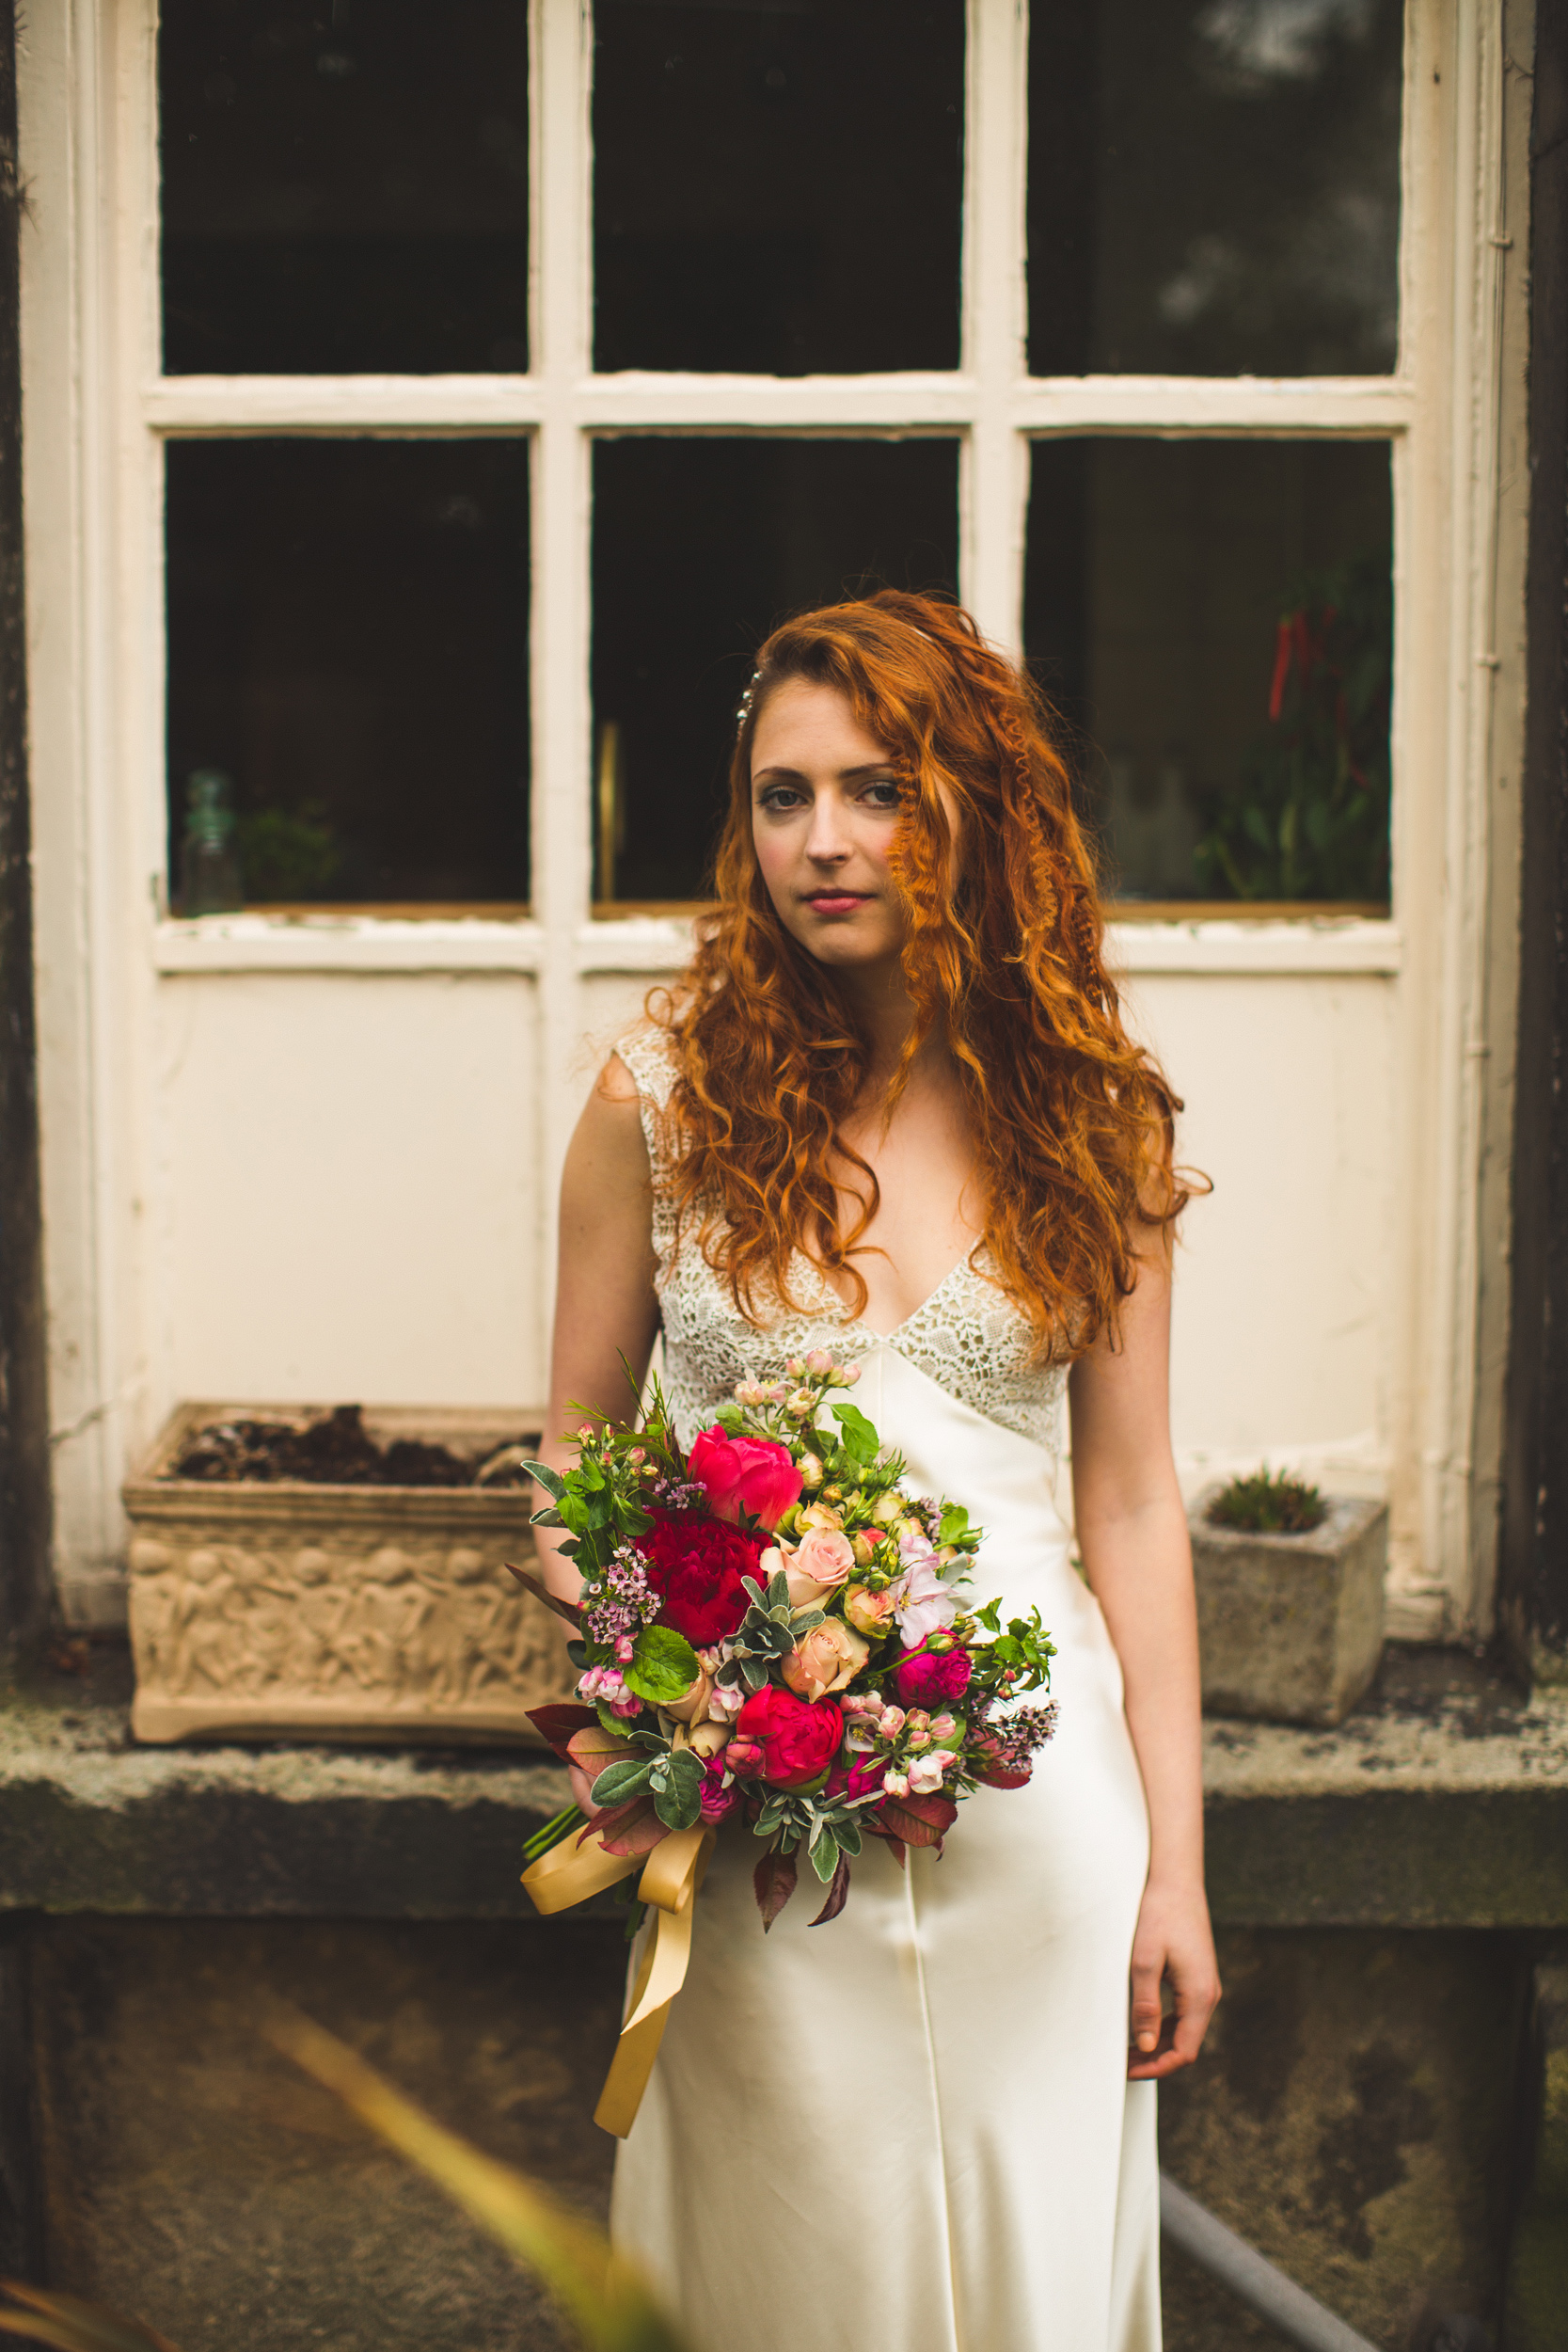 kate-beaumont-vintage-inspired-bridal-wedding-dresses-Sheffield-S6-18.jpg